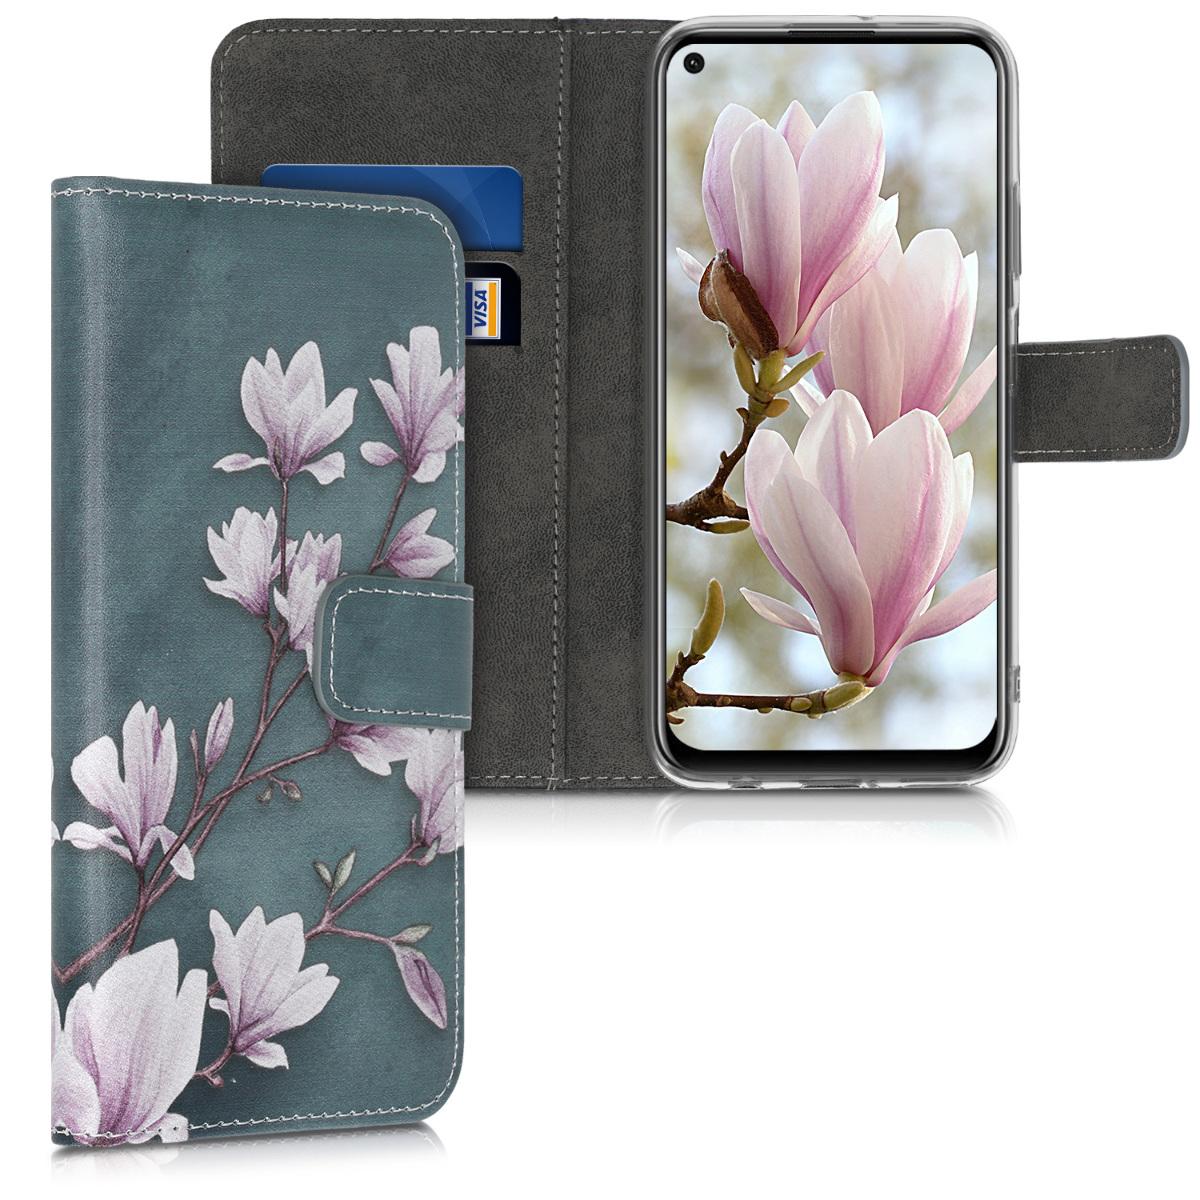 KW Θήκη Πορτοφόλι Huawei P40 Lite - Magnolias Taupe / White / Blue Grey (51487.01)